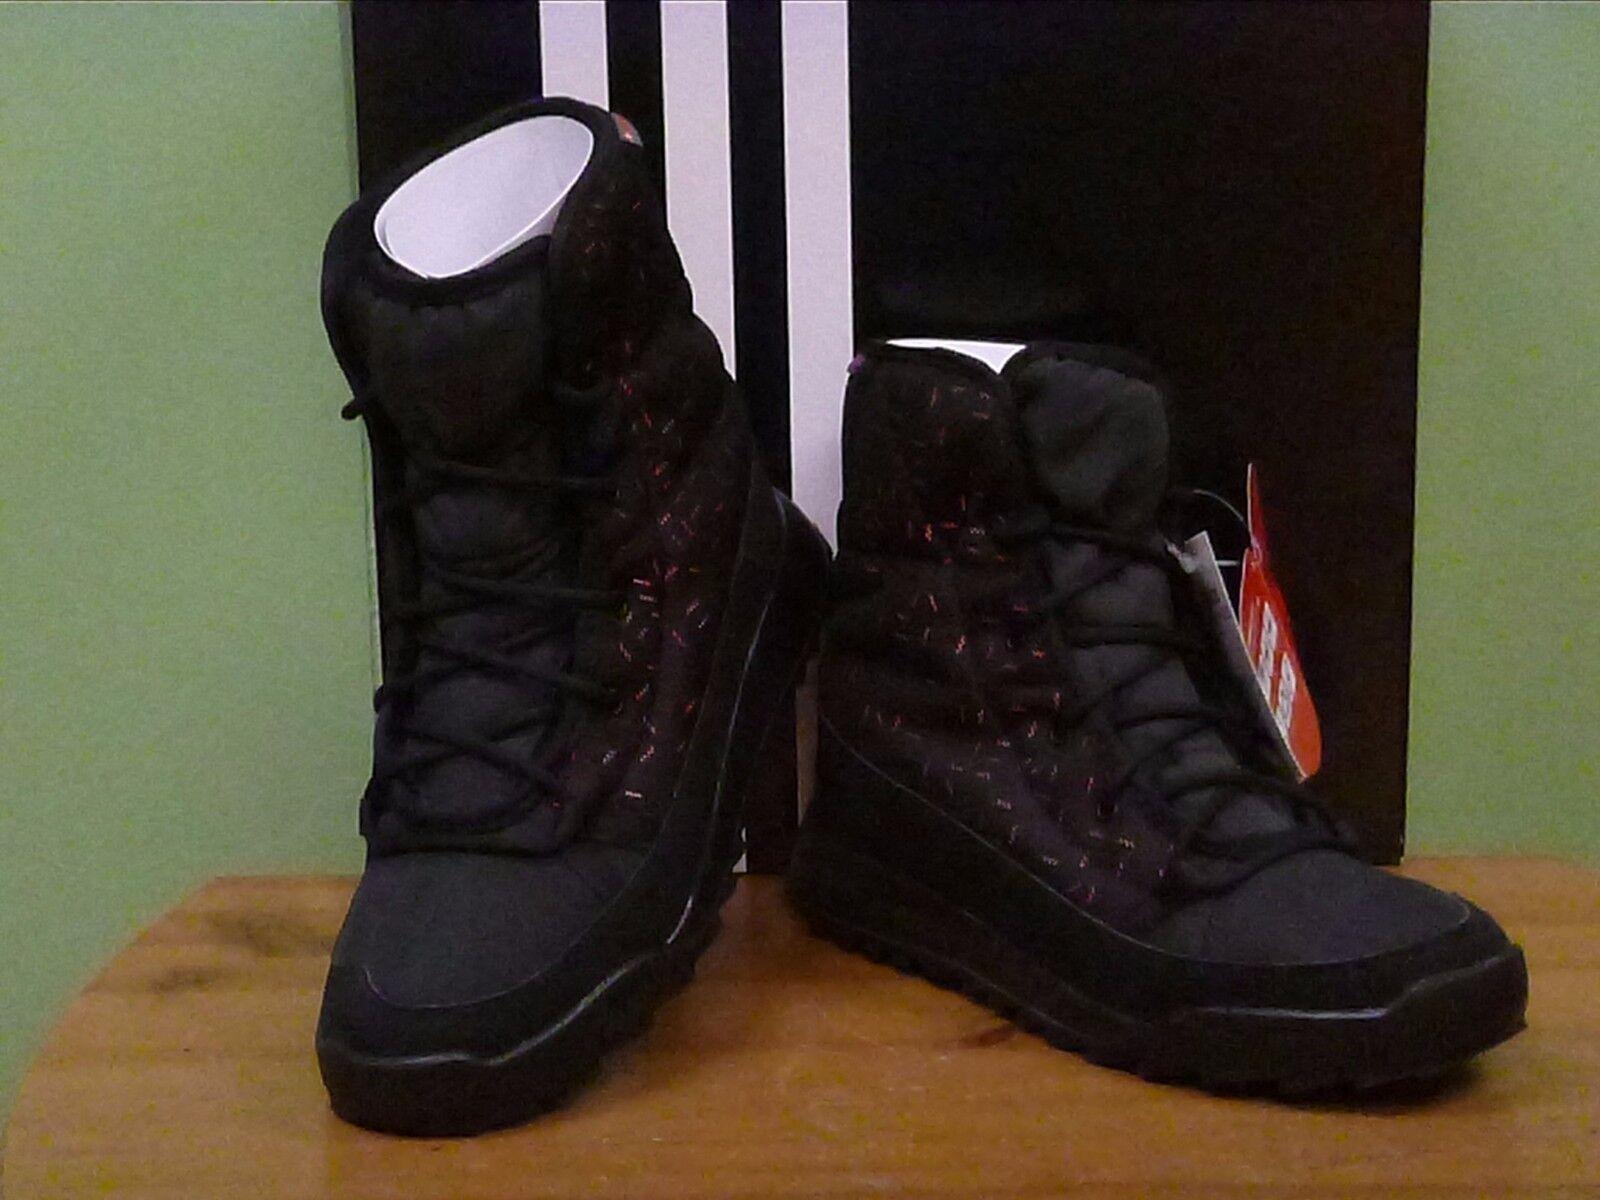 Adidas CW Choleah Padded CP Women's Boots Isolant Sz.9 US Black NIB